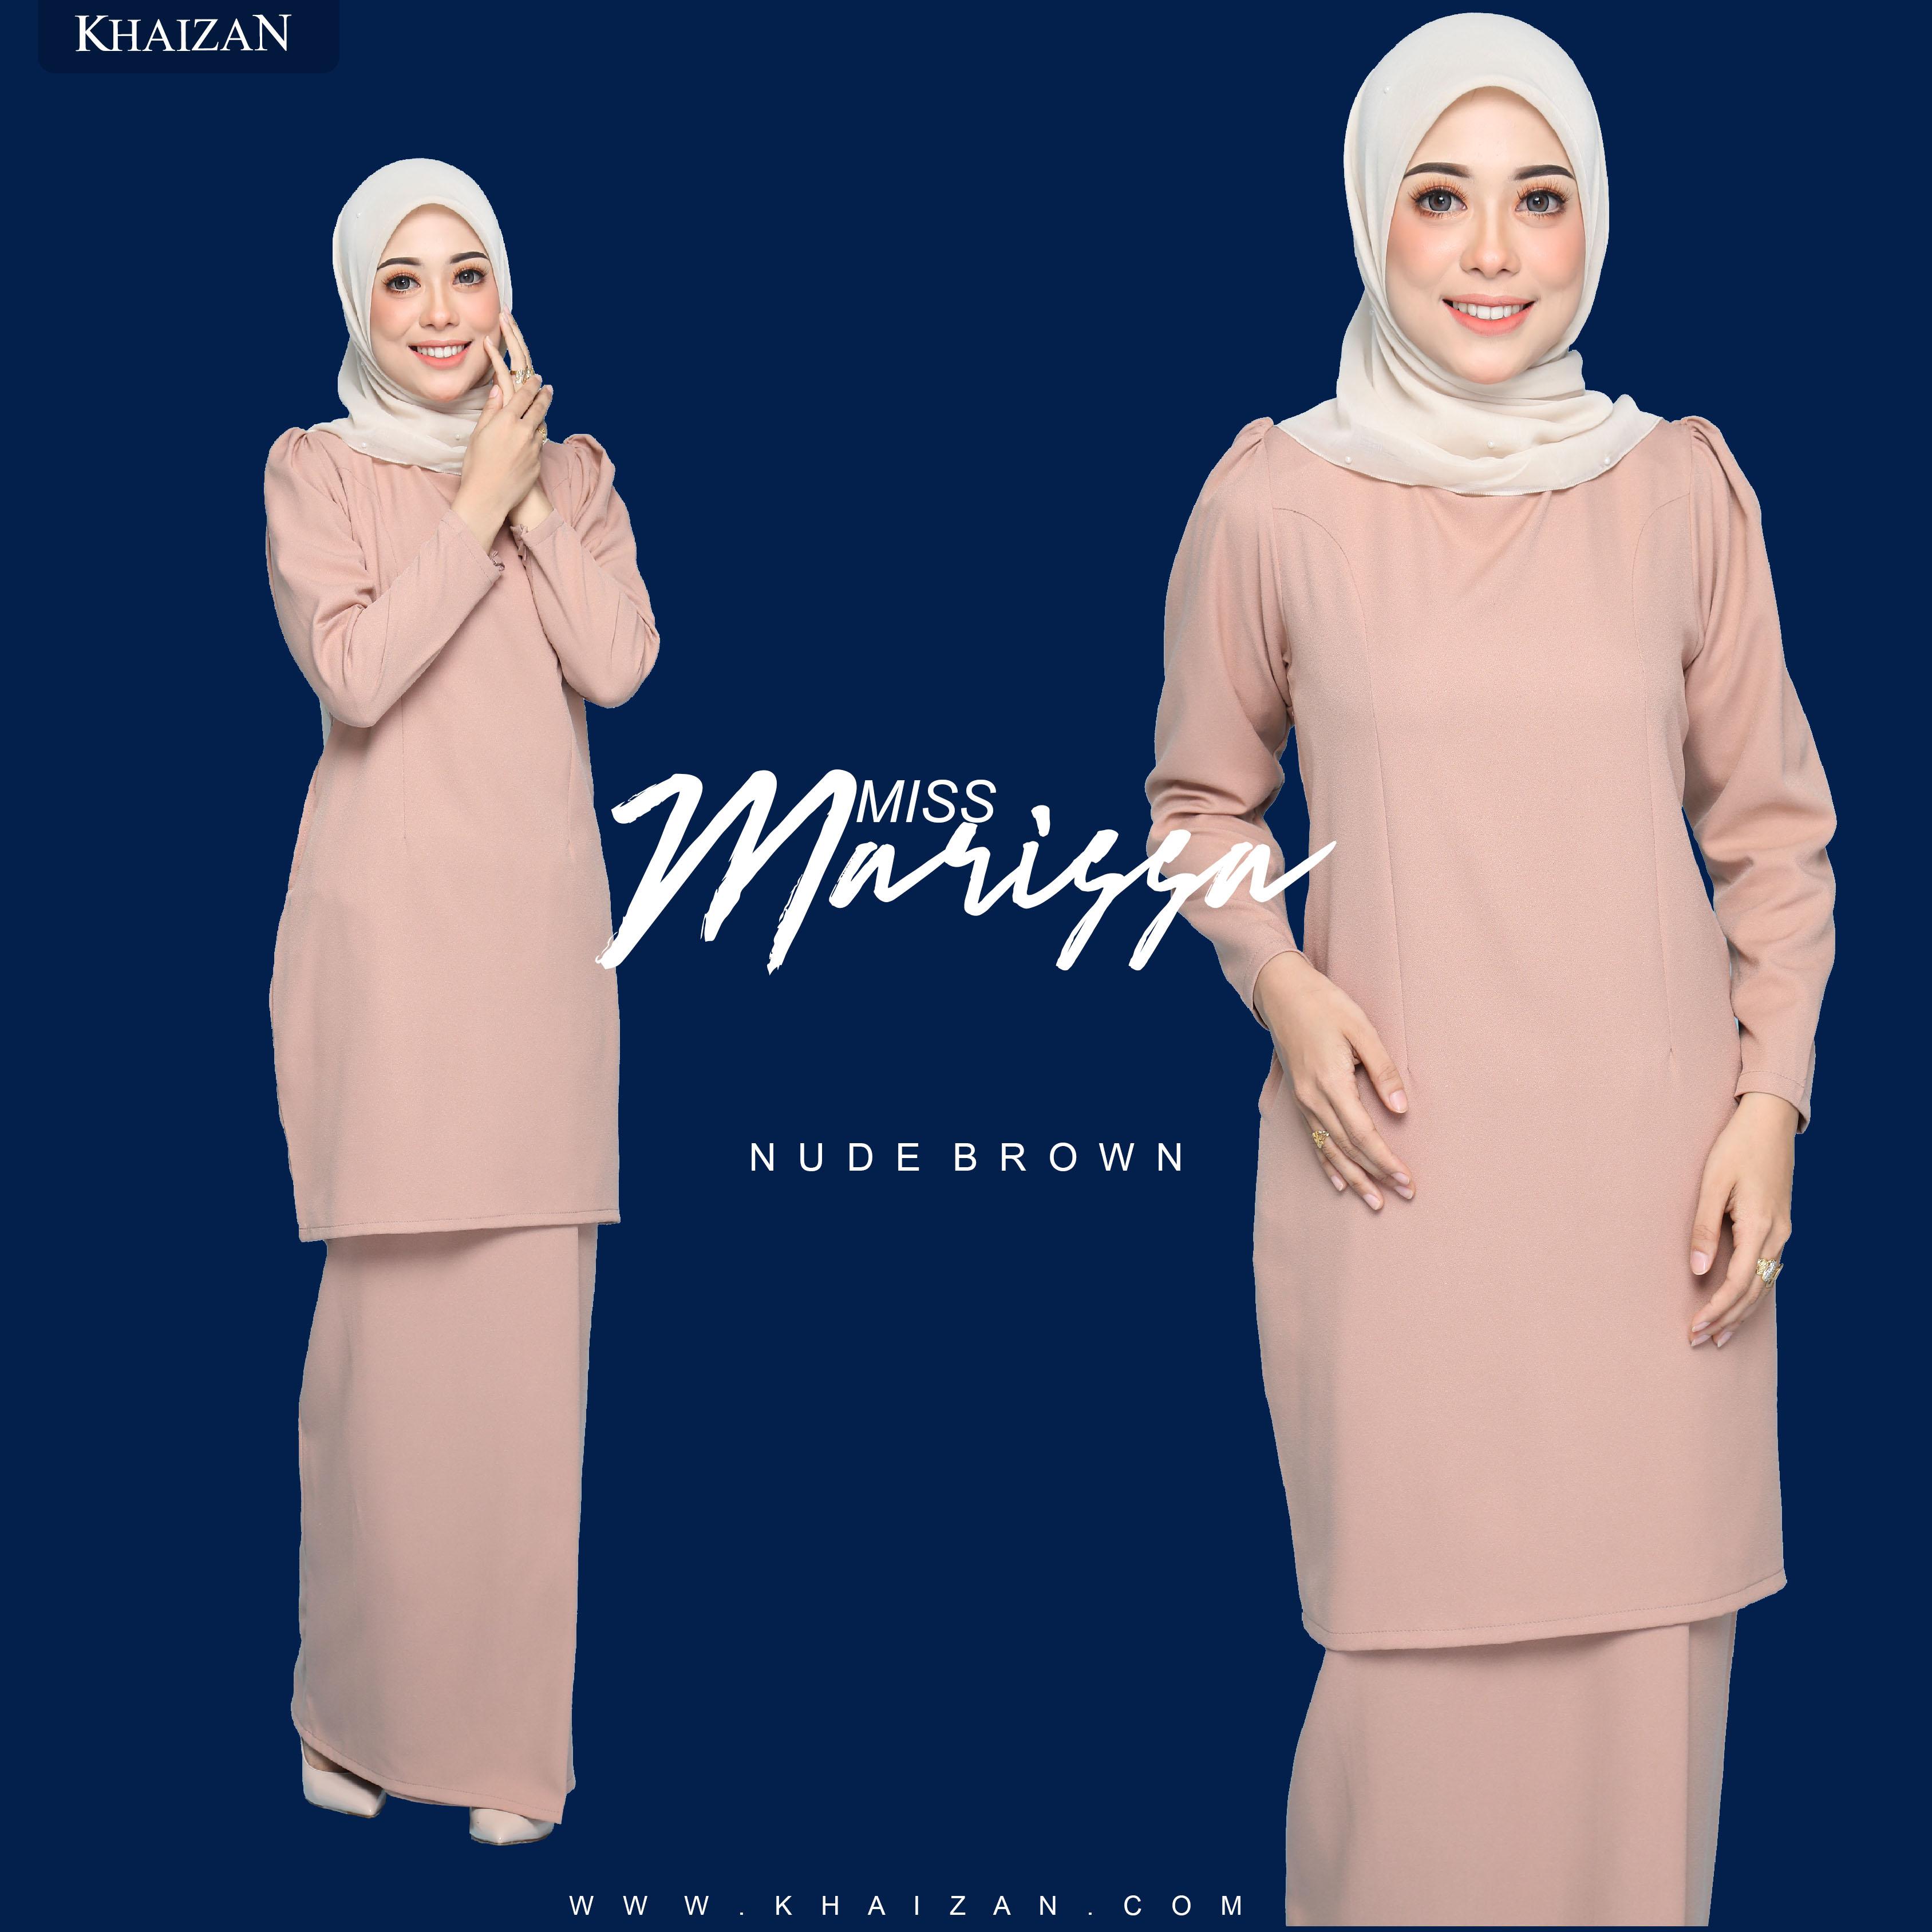 MISS MARISSA - NUDE BROWN